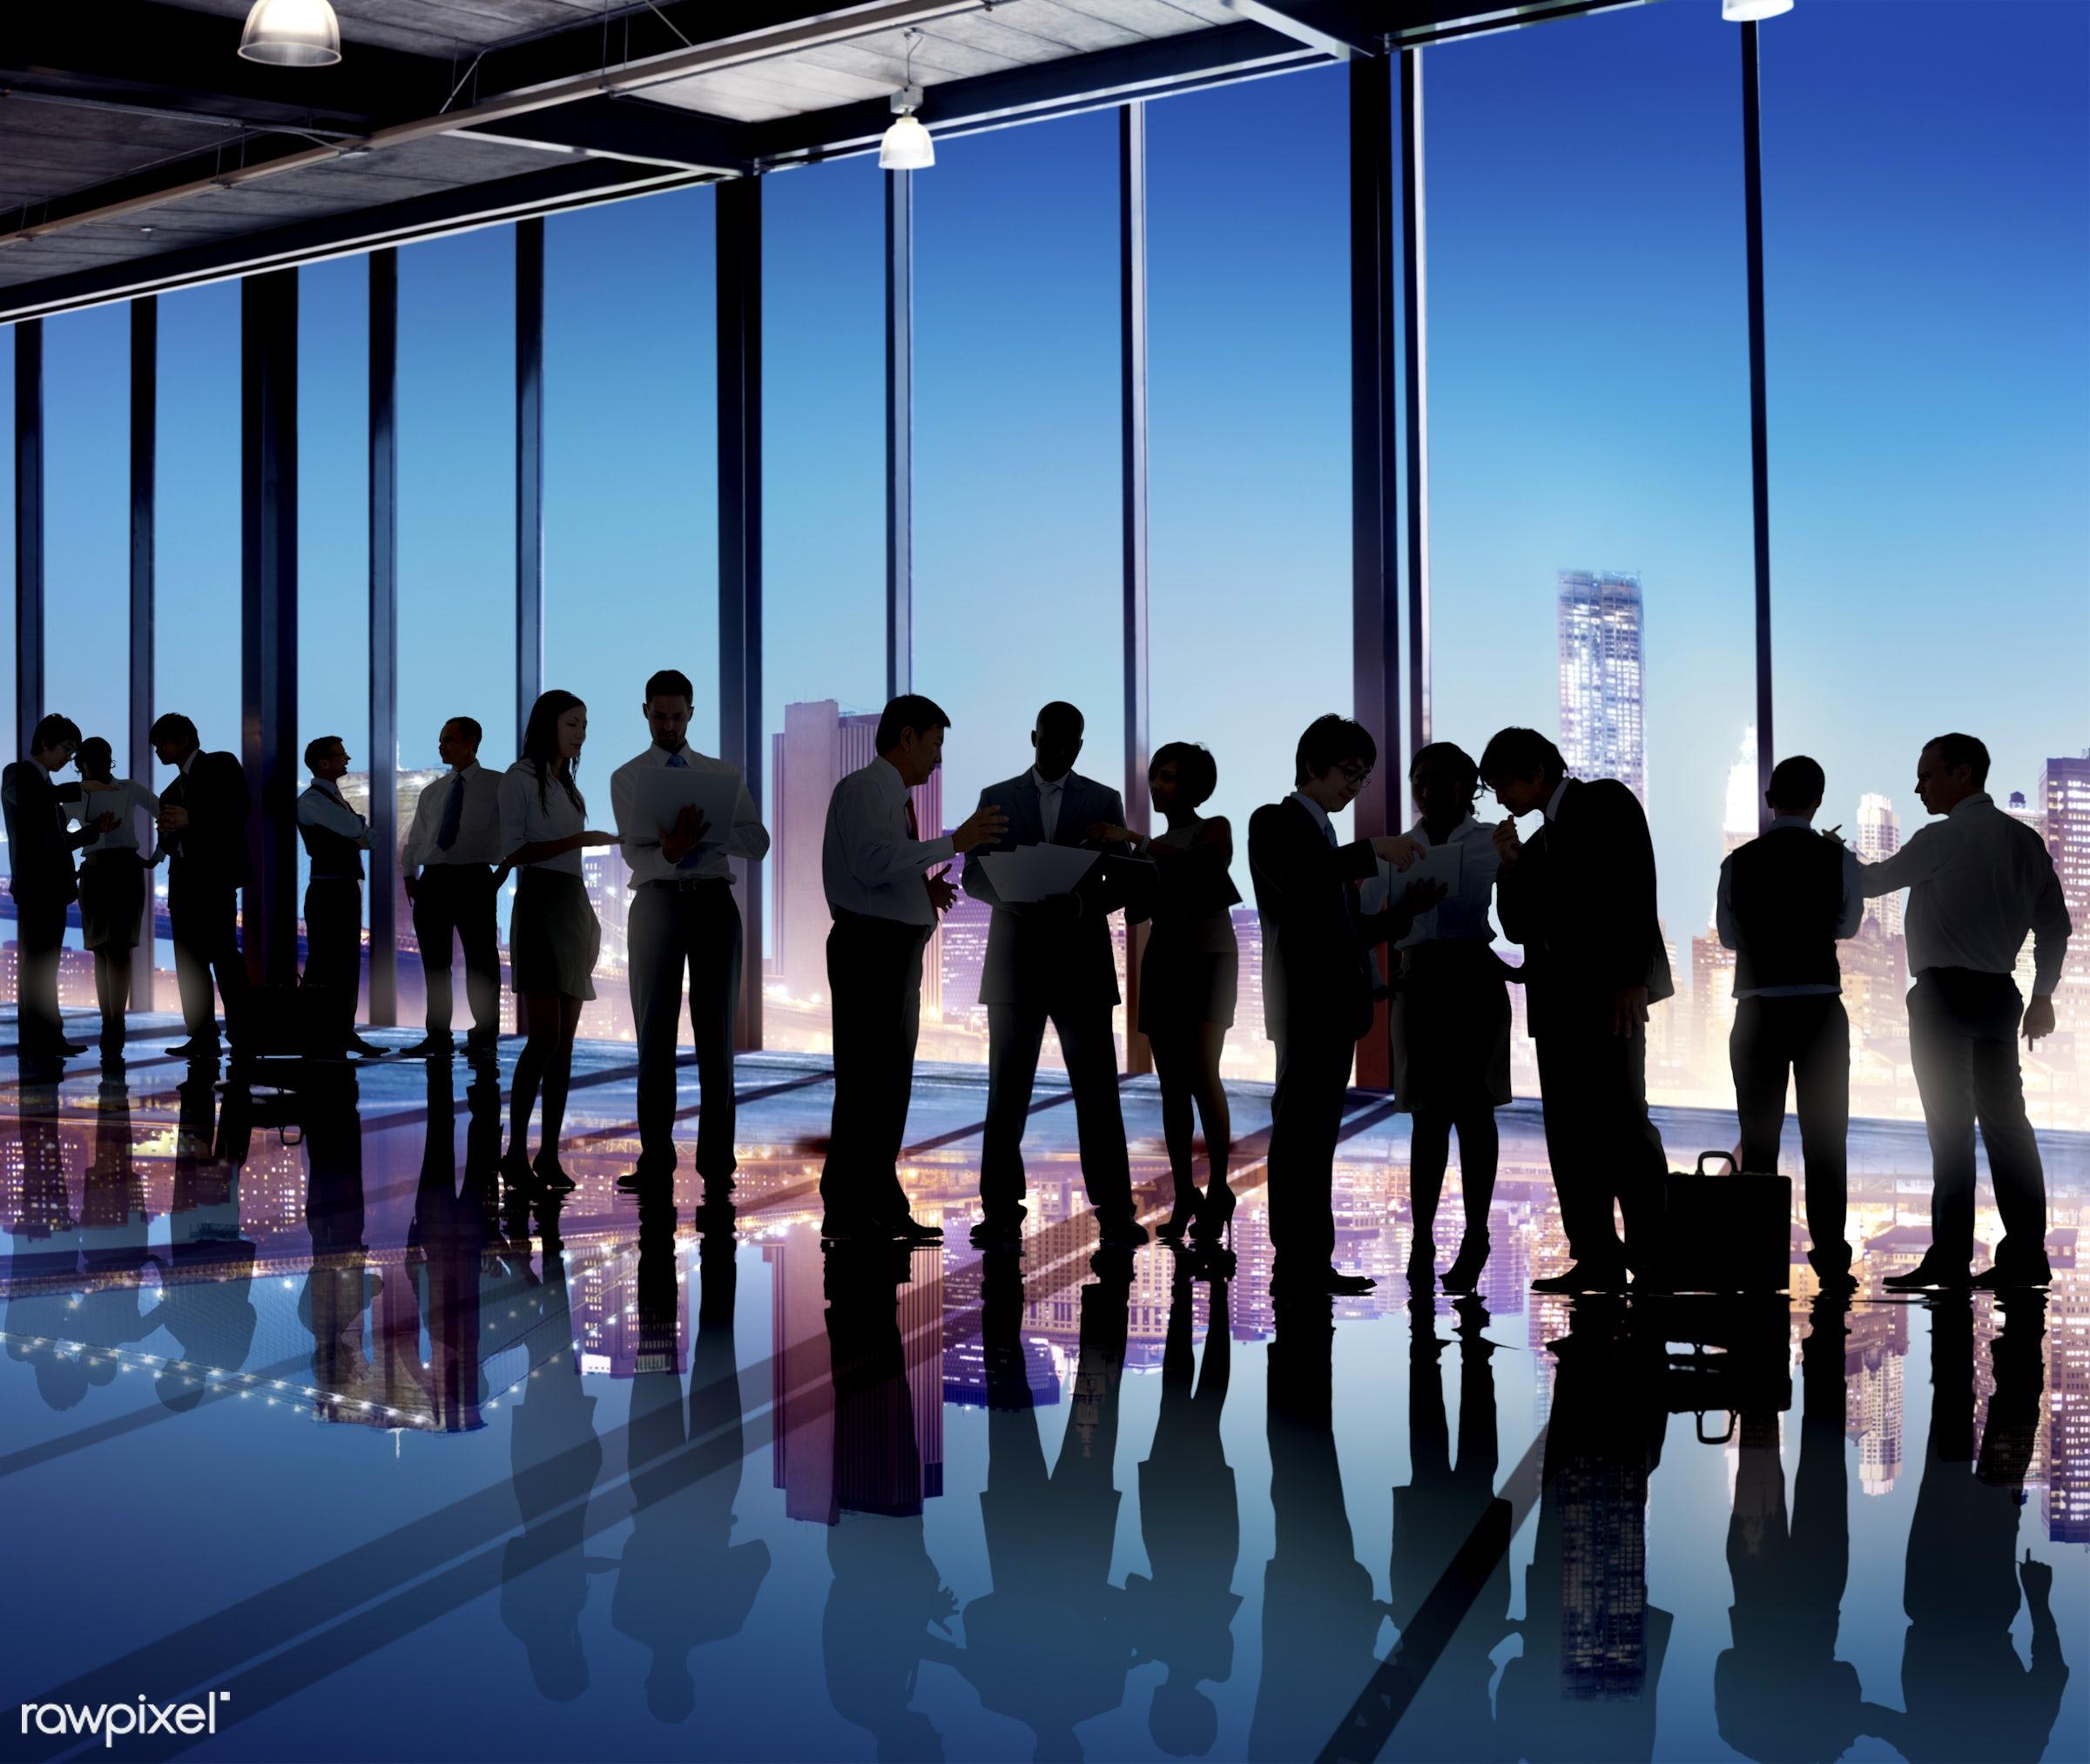 contemporary, back lit, brainstorming, building, business, business people, business person, businessman, businesswoman,...